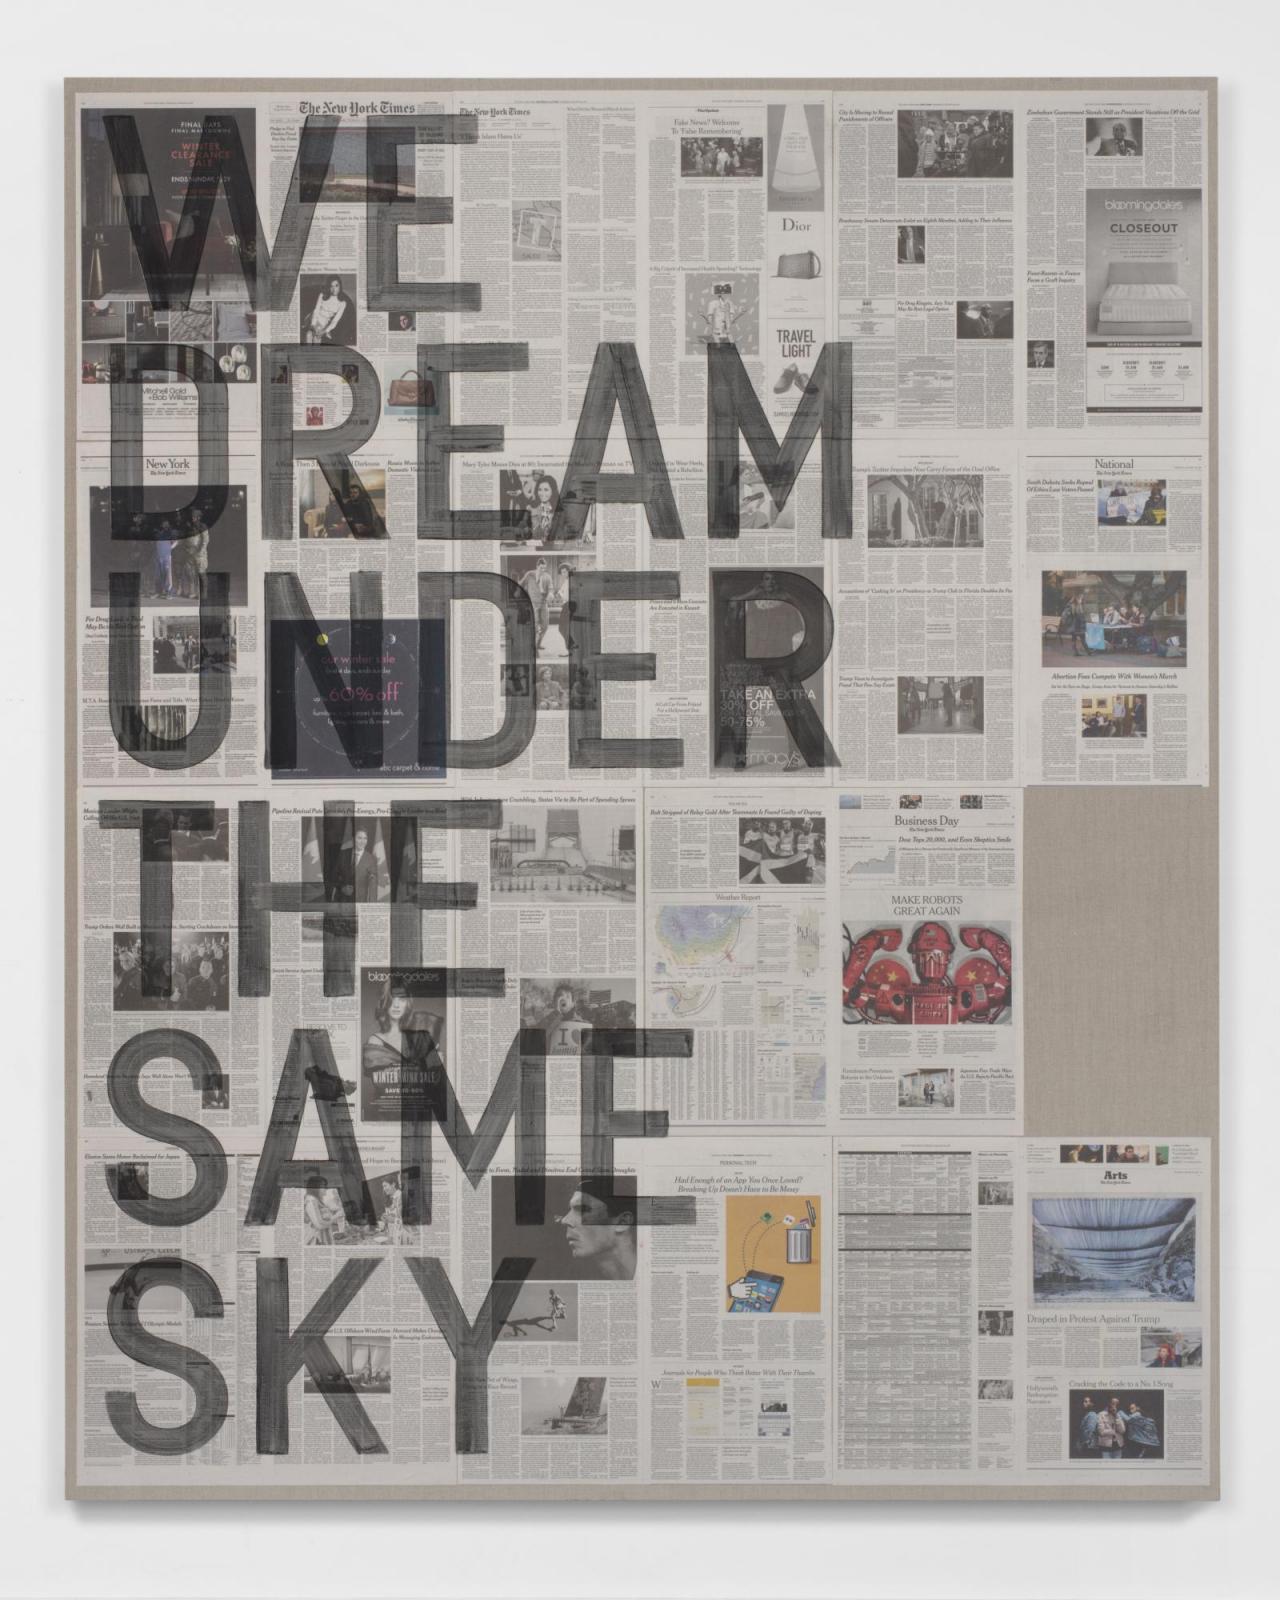 Rirkrit Tiravanija, untitled 2017 (we dream under the same sky, new york times, january 26, 2017), 2017 Acrylic on NY Times newspapers. 229 x 185 cm. Photo courtesy of the artist, Maja Hoffmann / LUMA Foundation, Arles and Galerie Chantal Crousel, Paris.